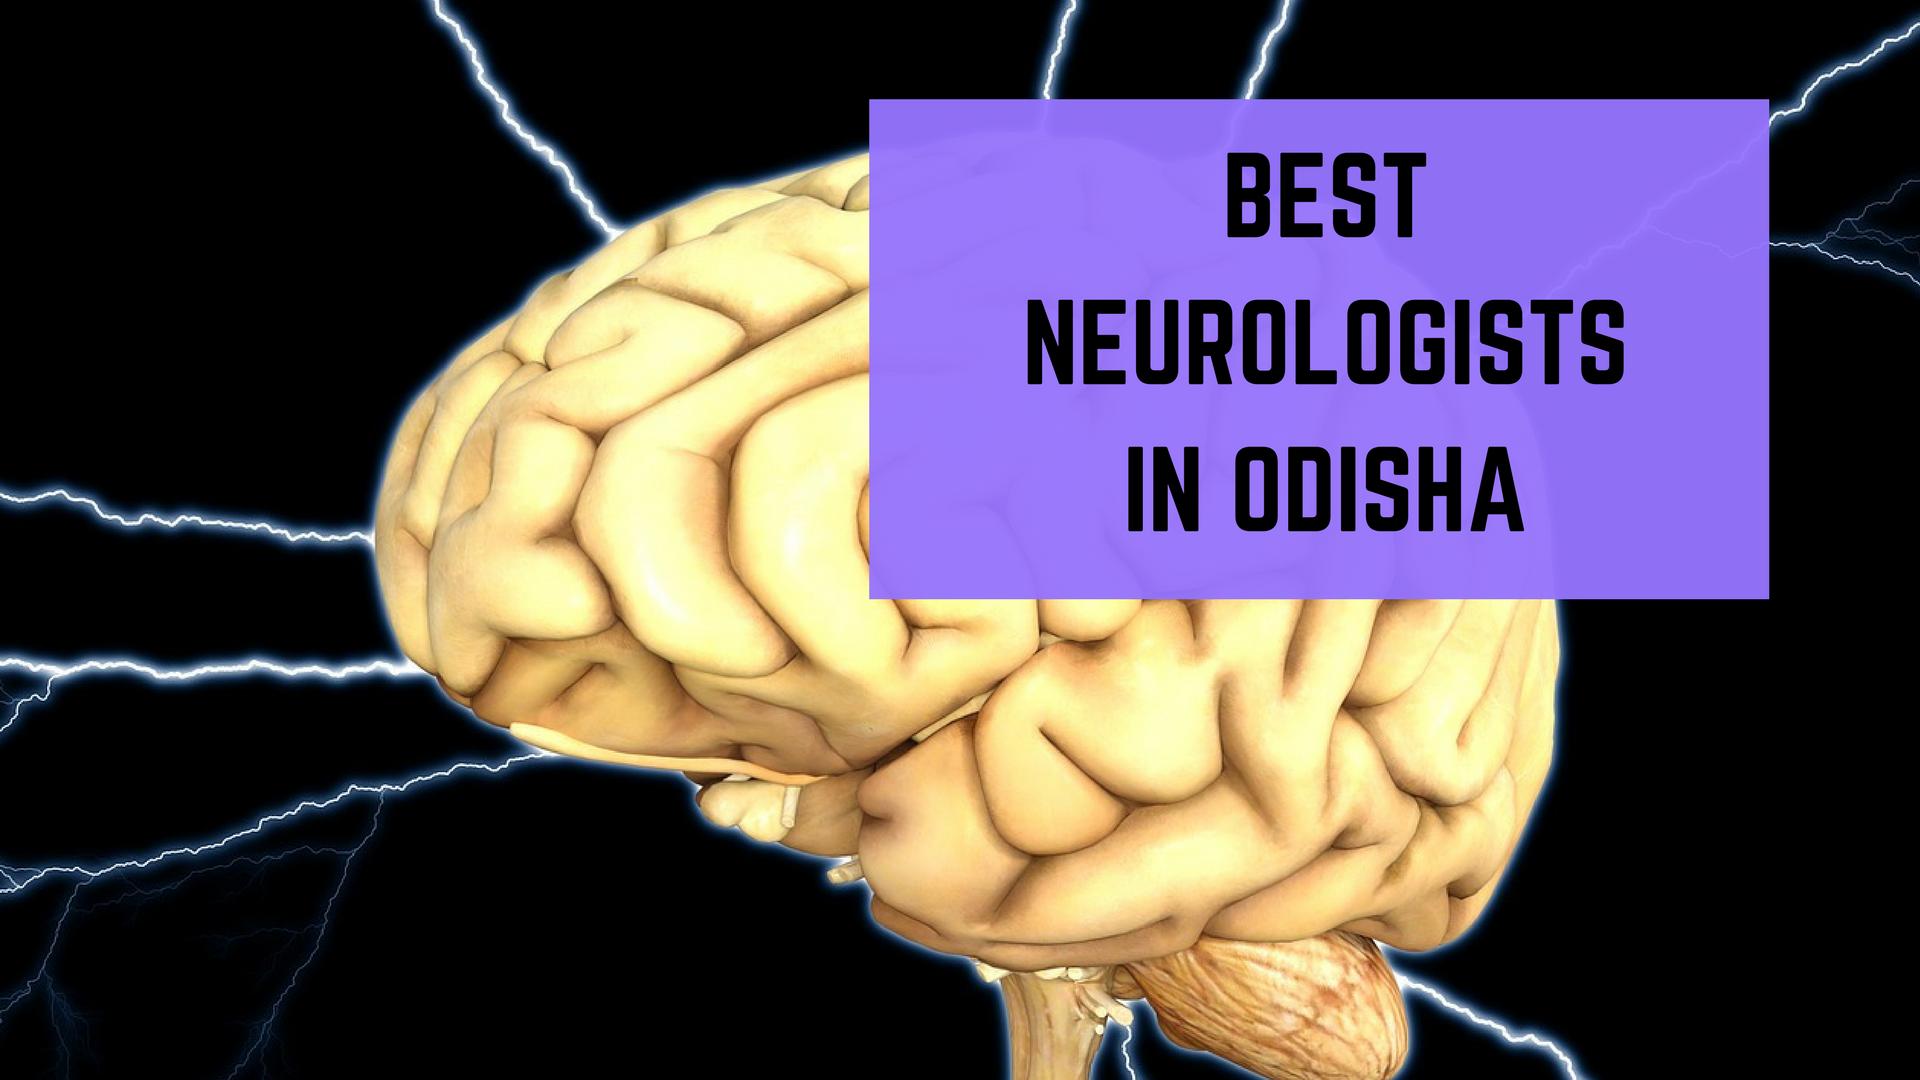 Essencz2 - best Neurologists in Odisha - Essencz